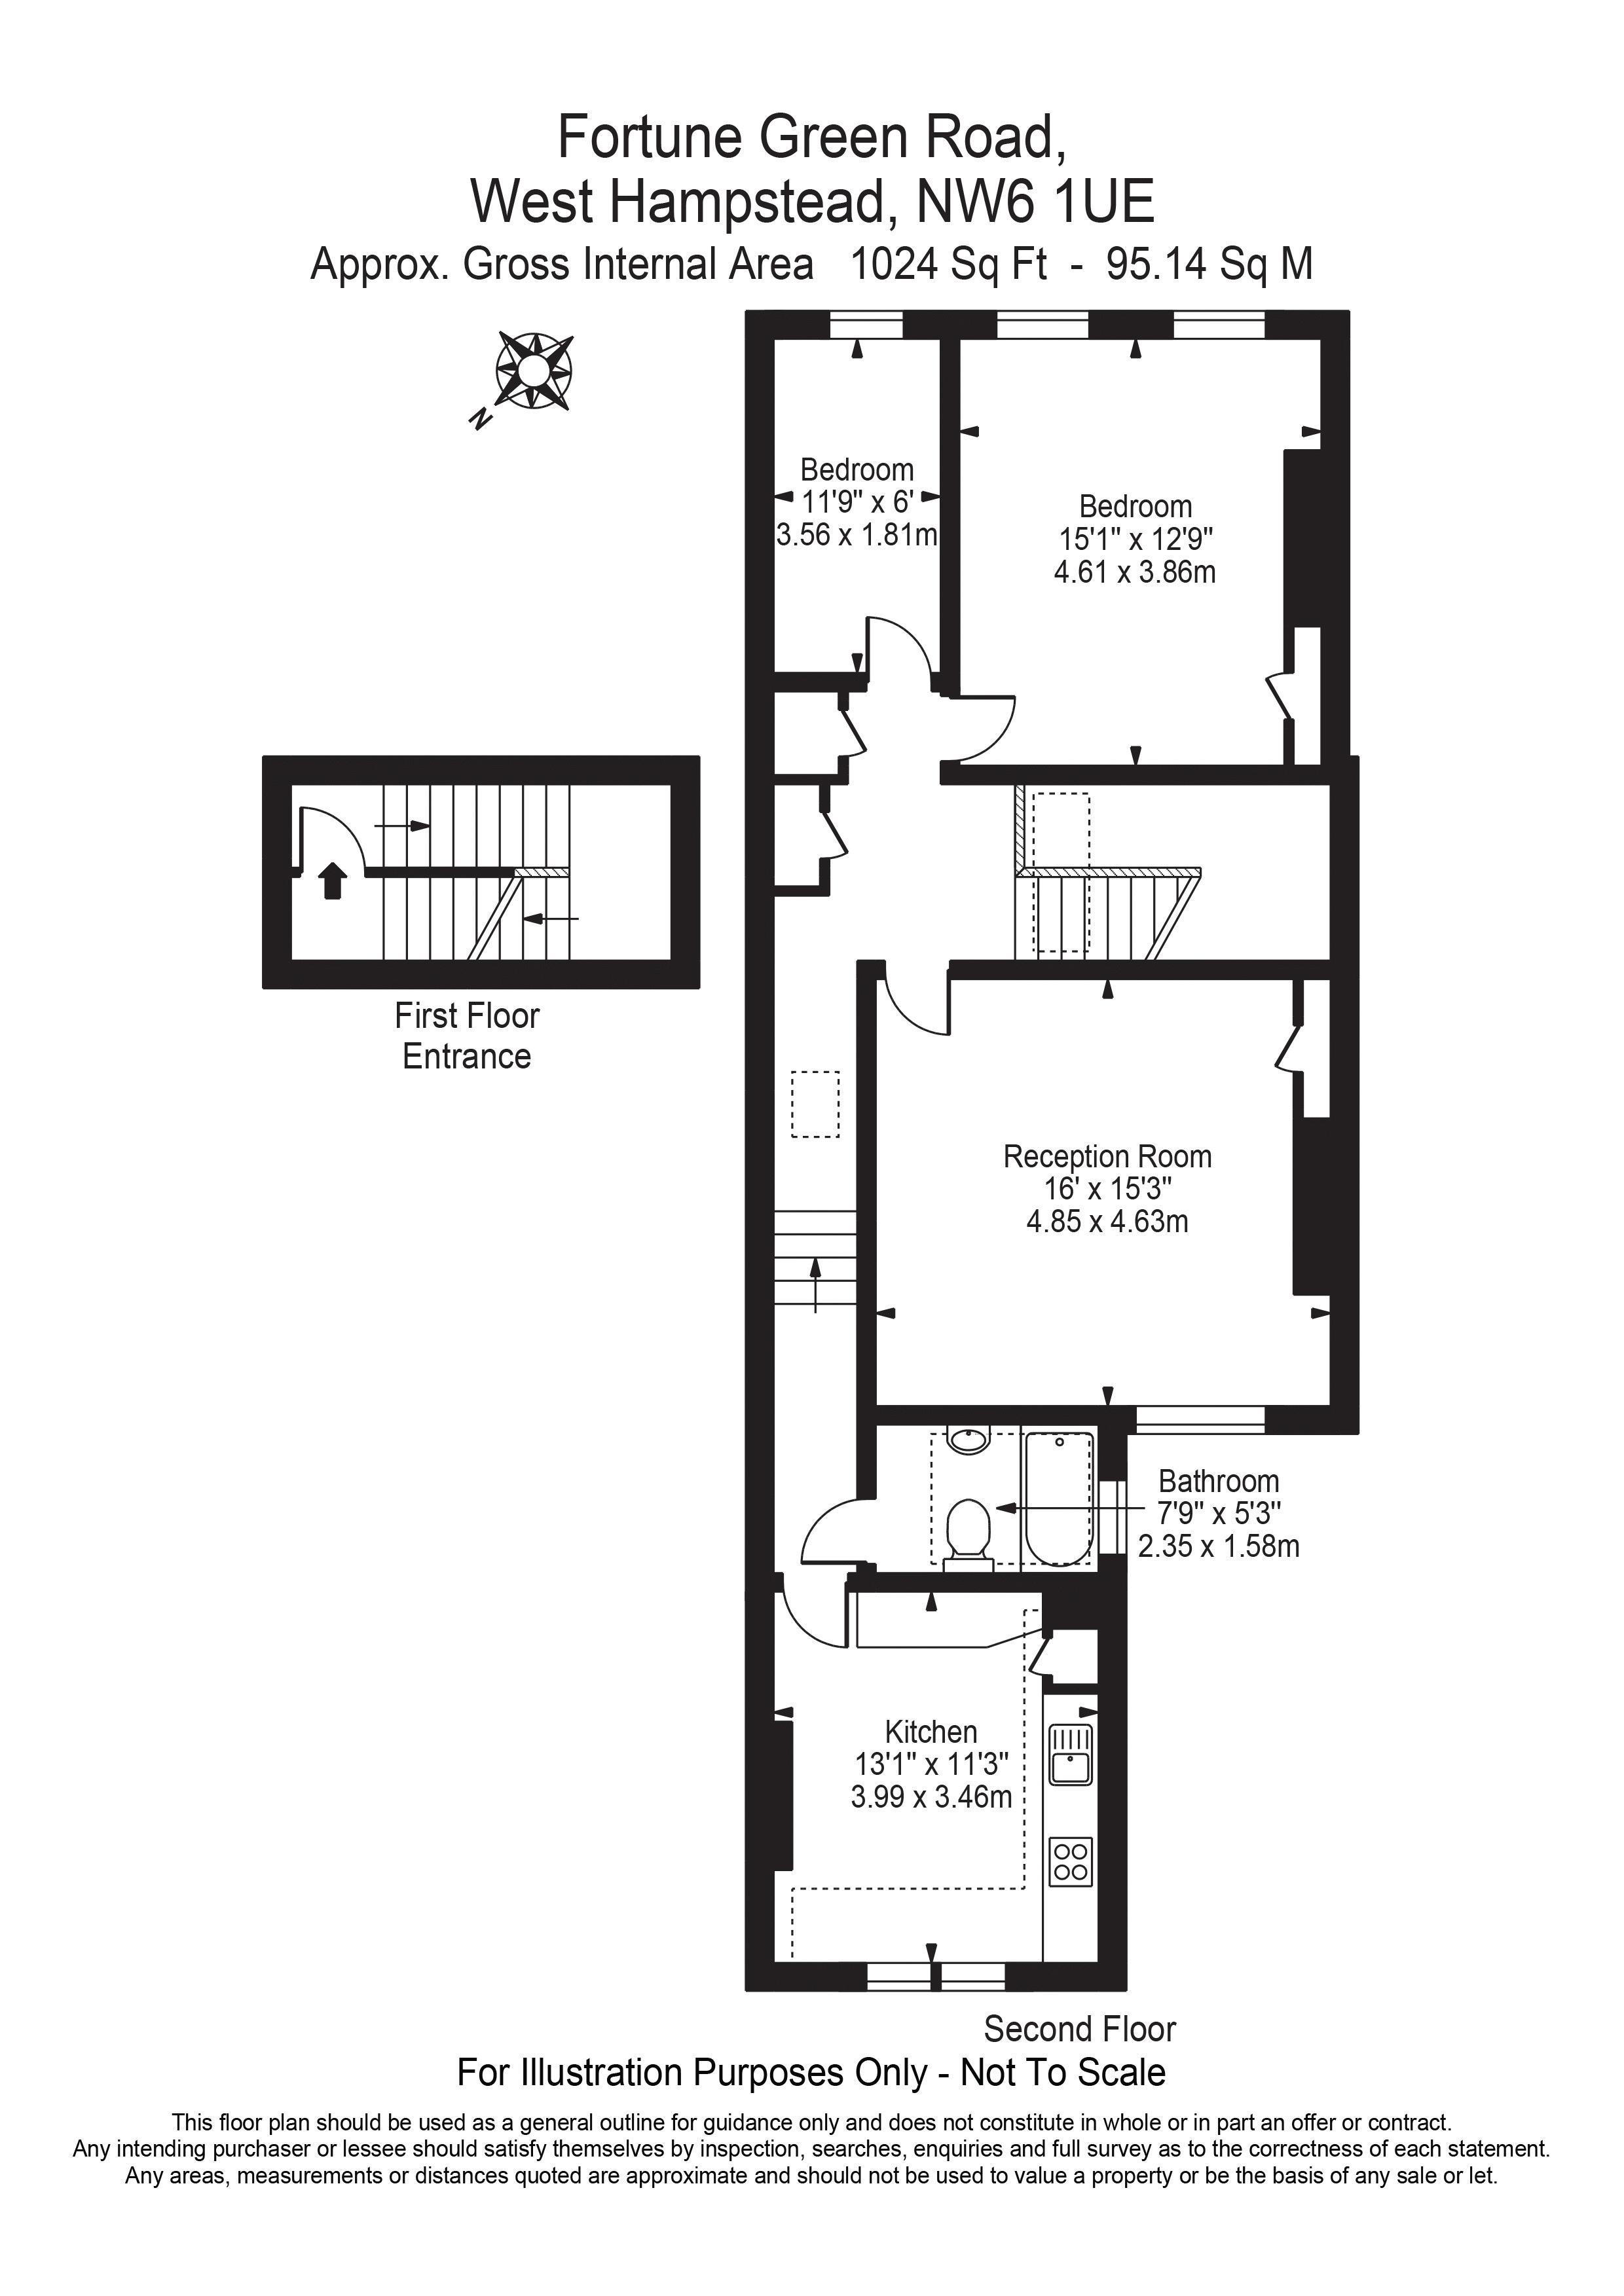 Floorplan - 24C Fortune Green Road